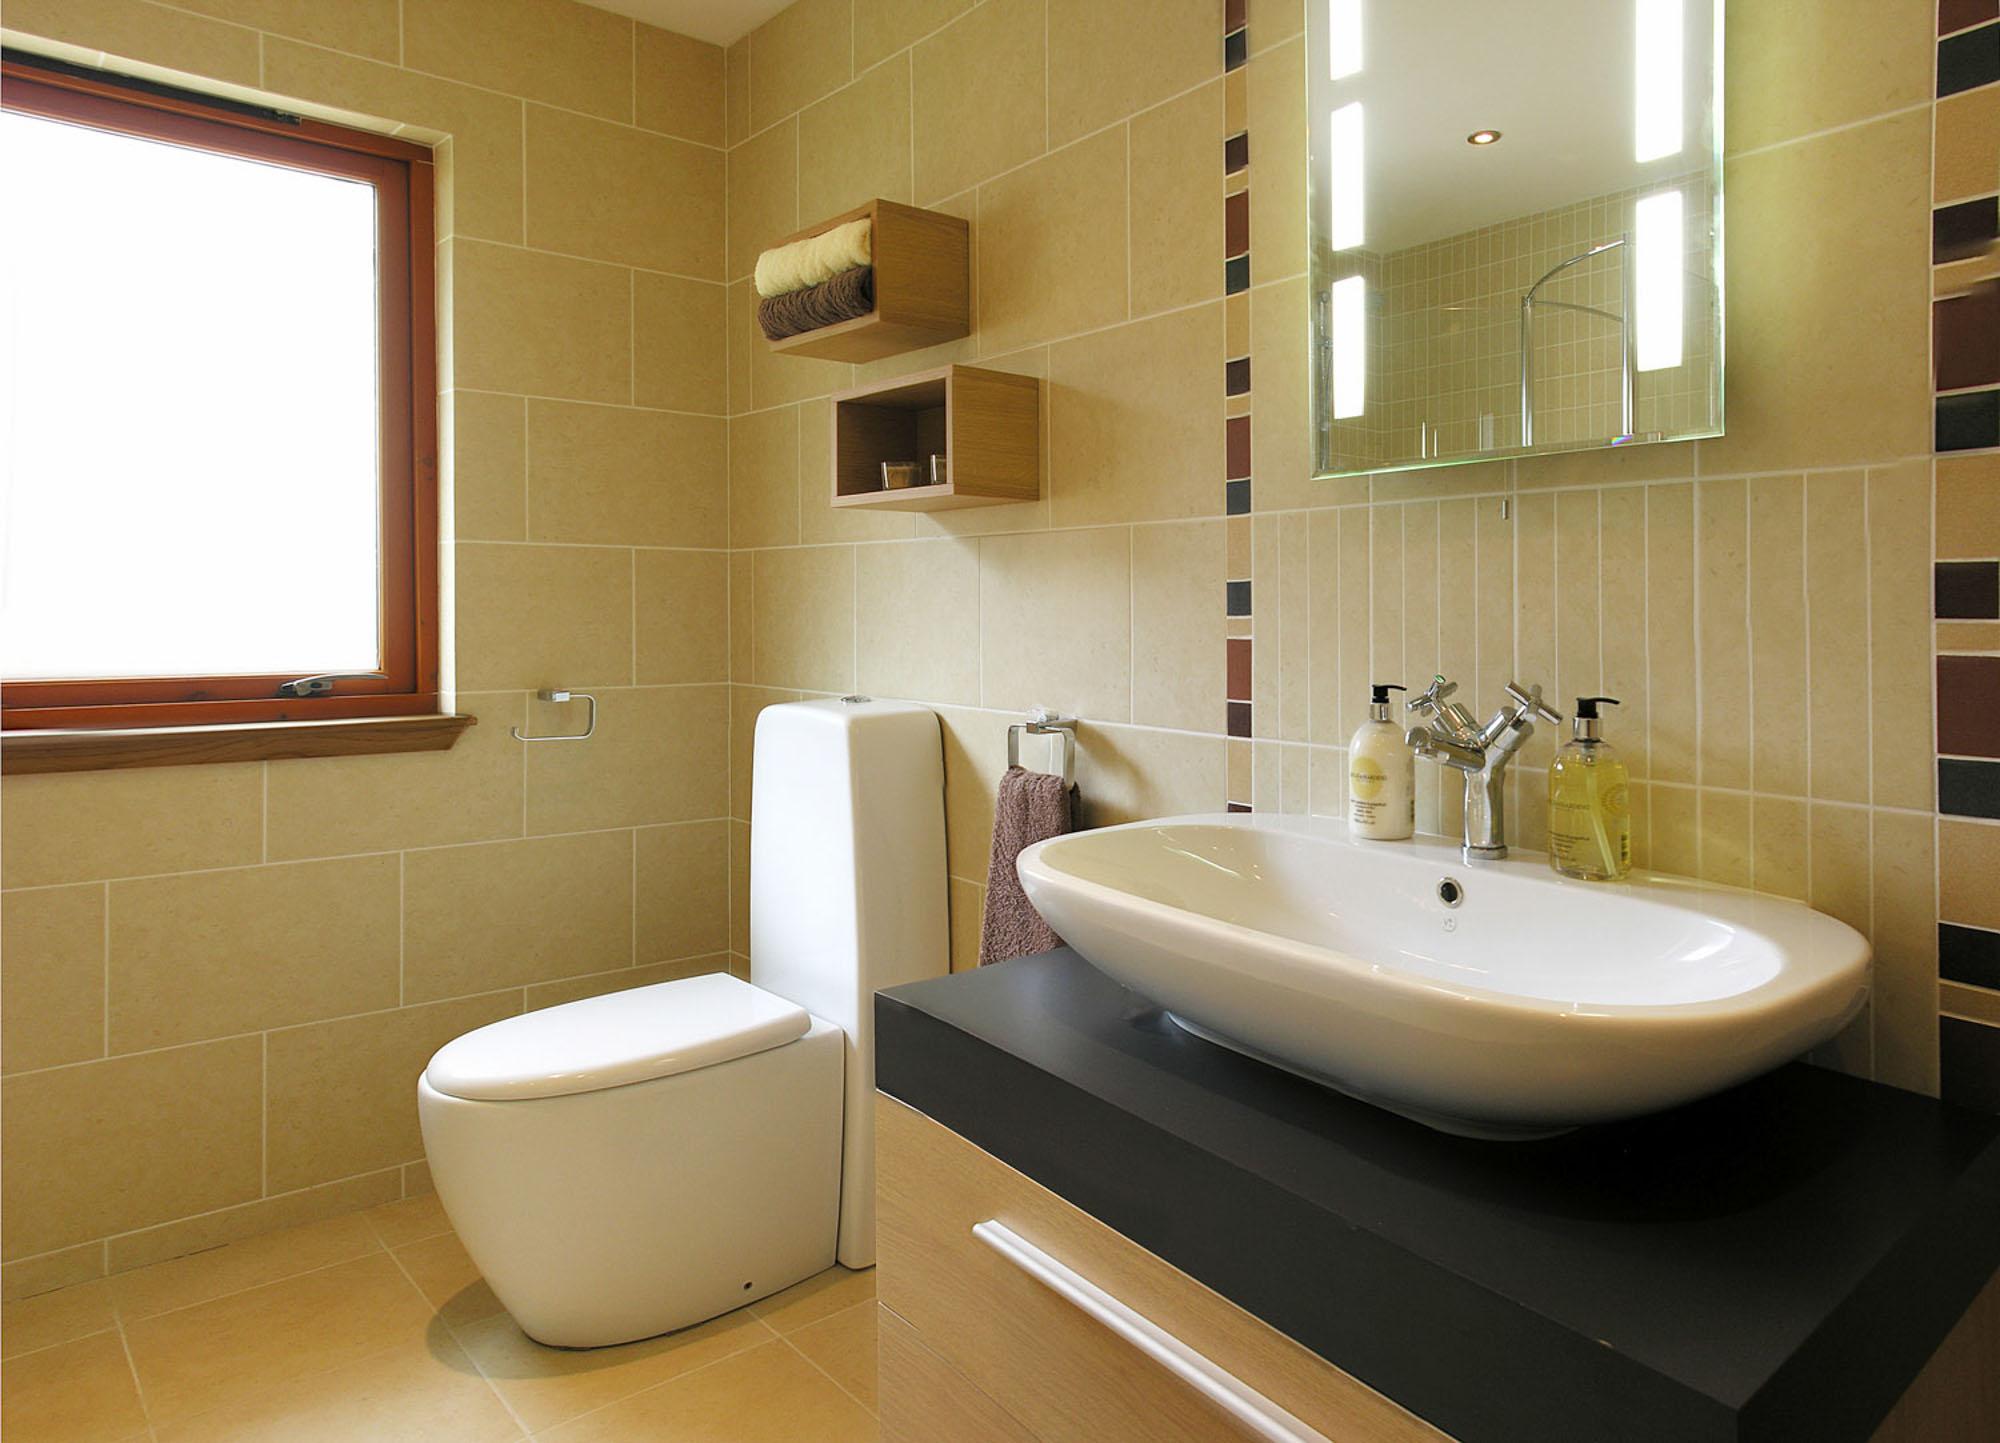 blairmount bathroom view 1.jpg